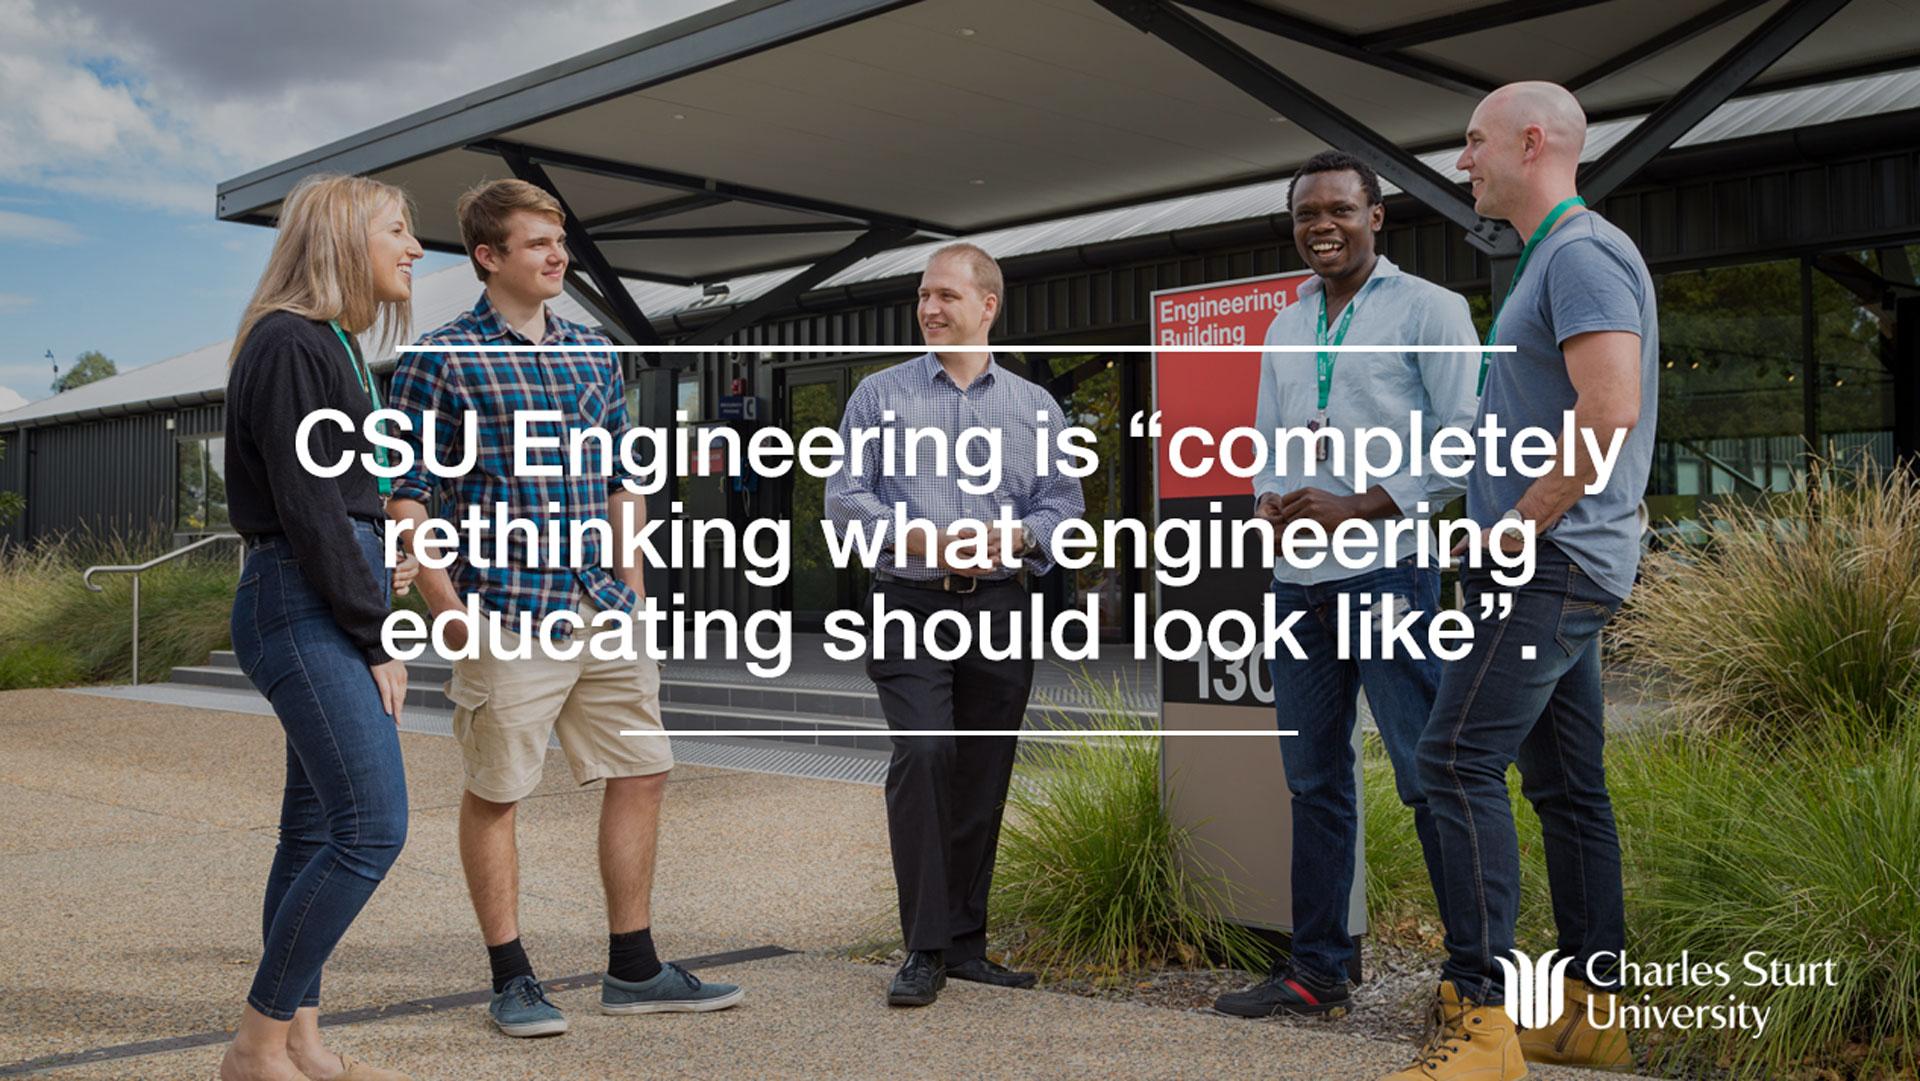 MIT Names Charles Sturt University One of the World's Top Emerging Engineering Schools